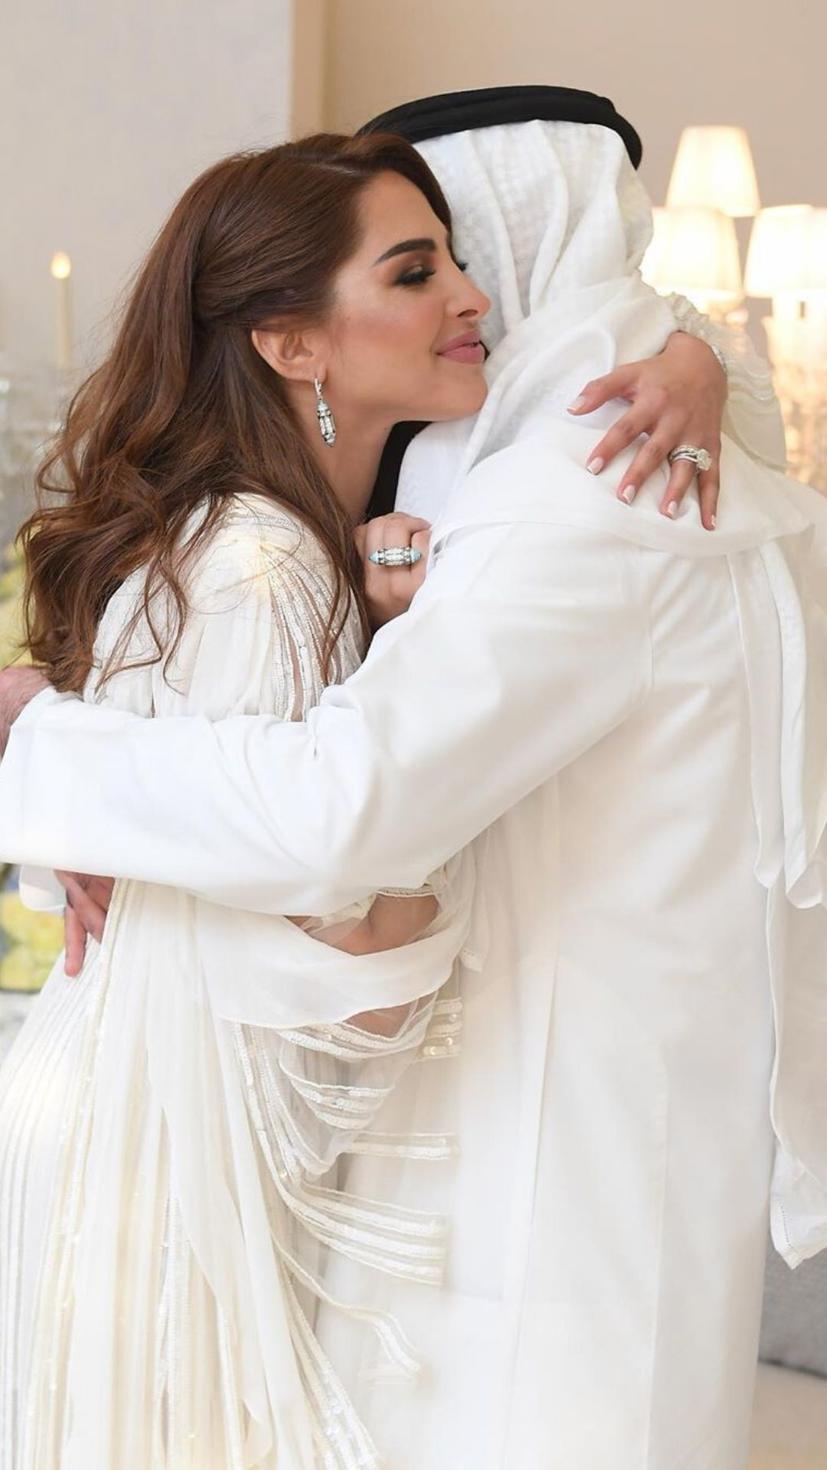 Fouz Al Fahad shares more details about her super secret wedding